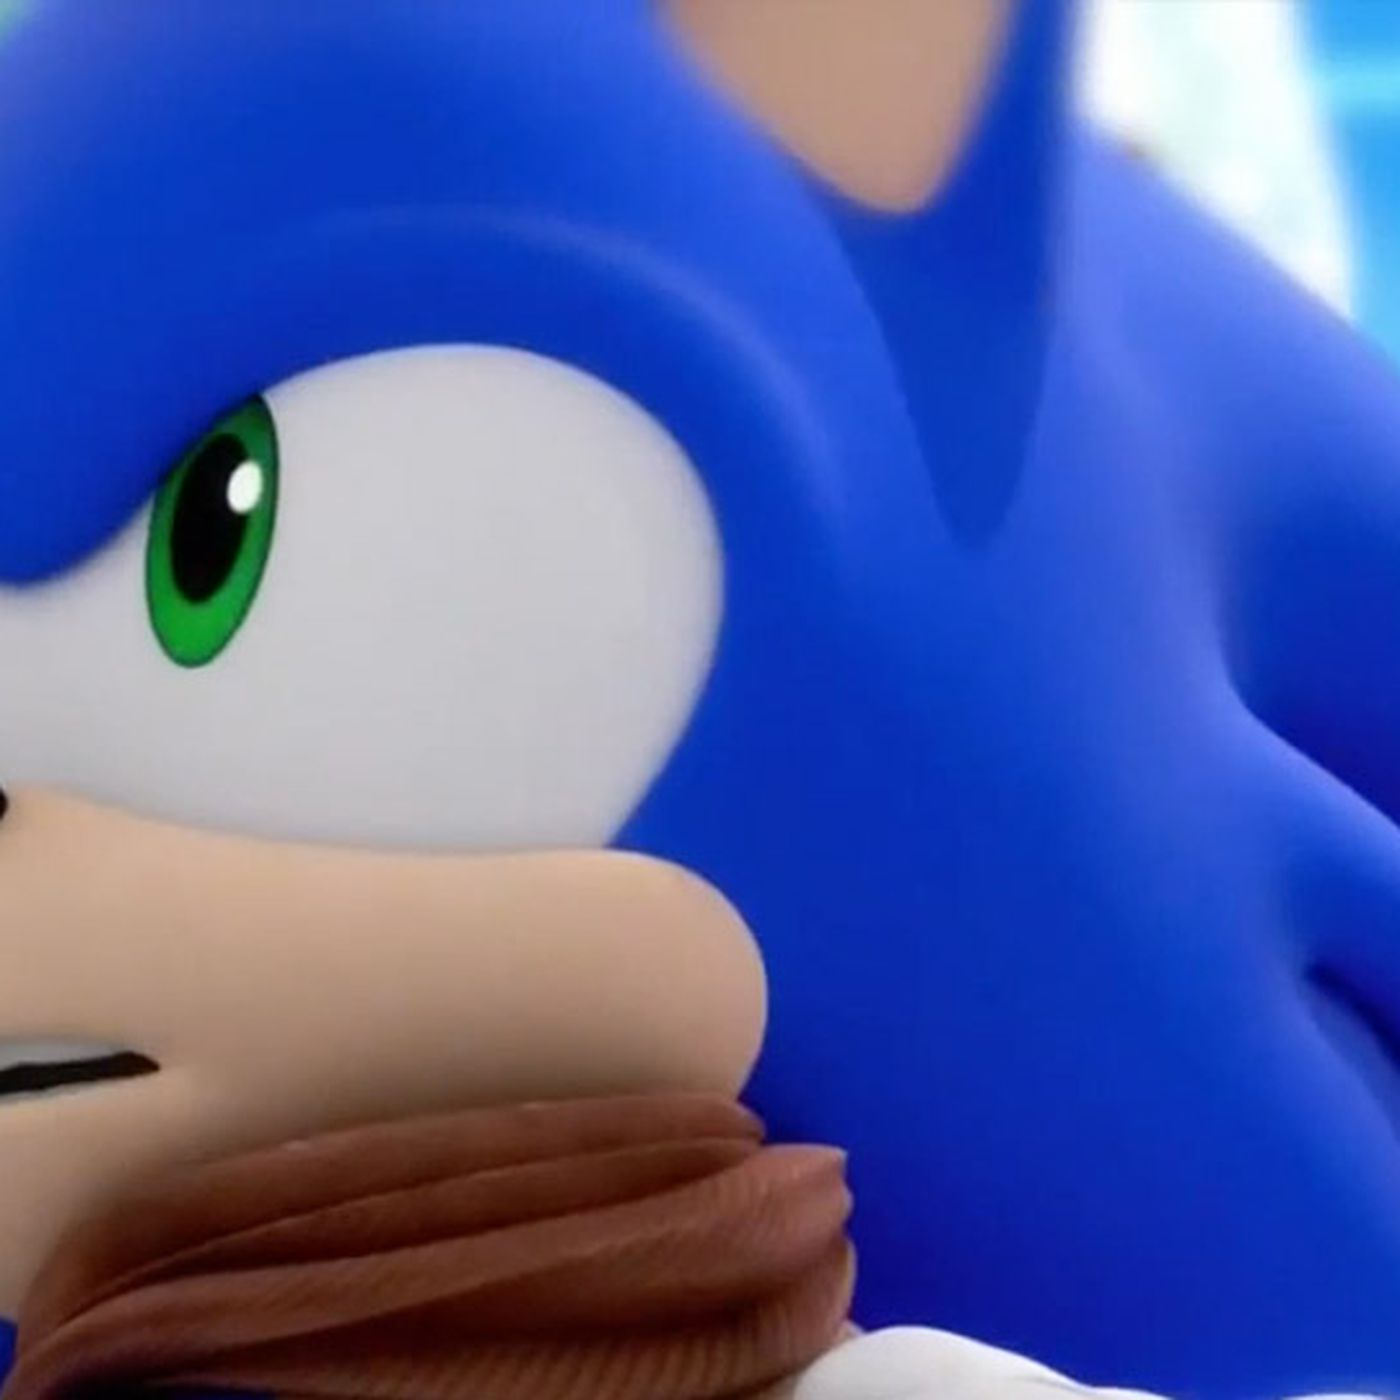 The Sonic the Hedgehog cartoon got real weird for a brief